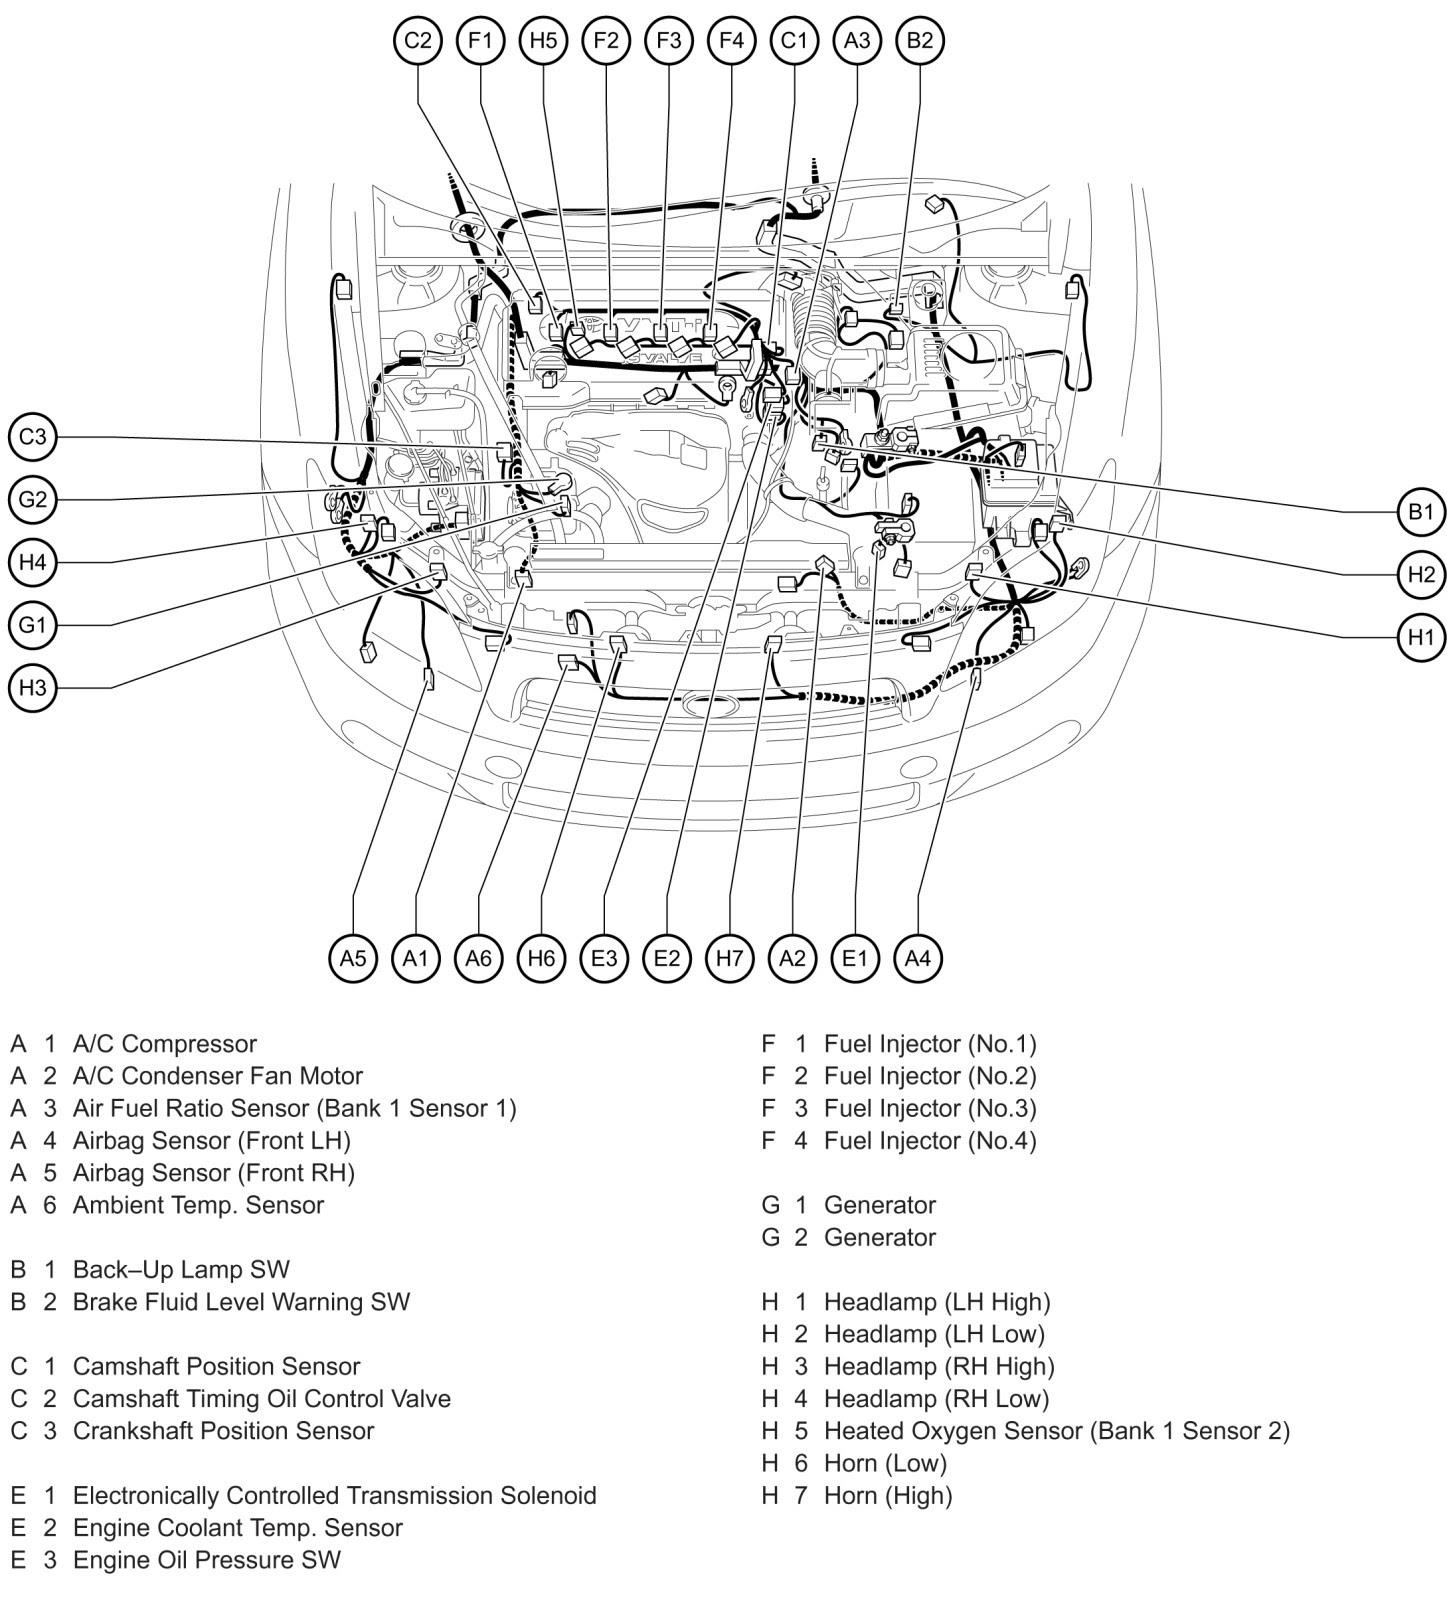 Diagram 2011 Scion Tc Headlight Wiring Diagram Full Version Hd Quality Wiring Diagram Sitexbubb Disegnoegrafica It